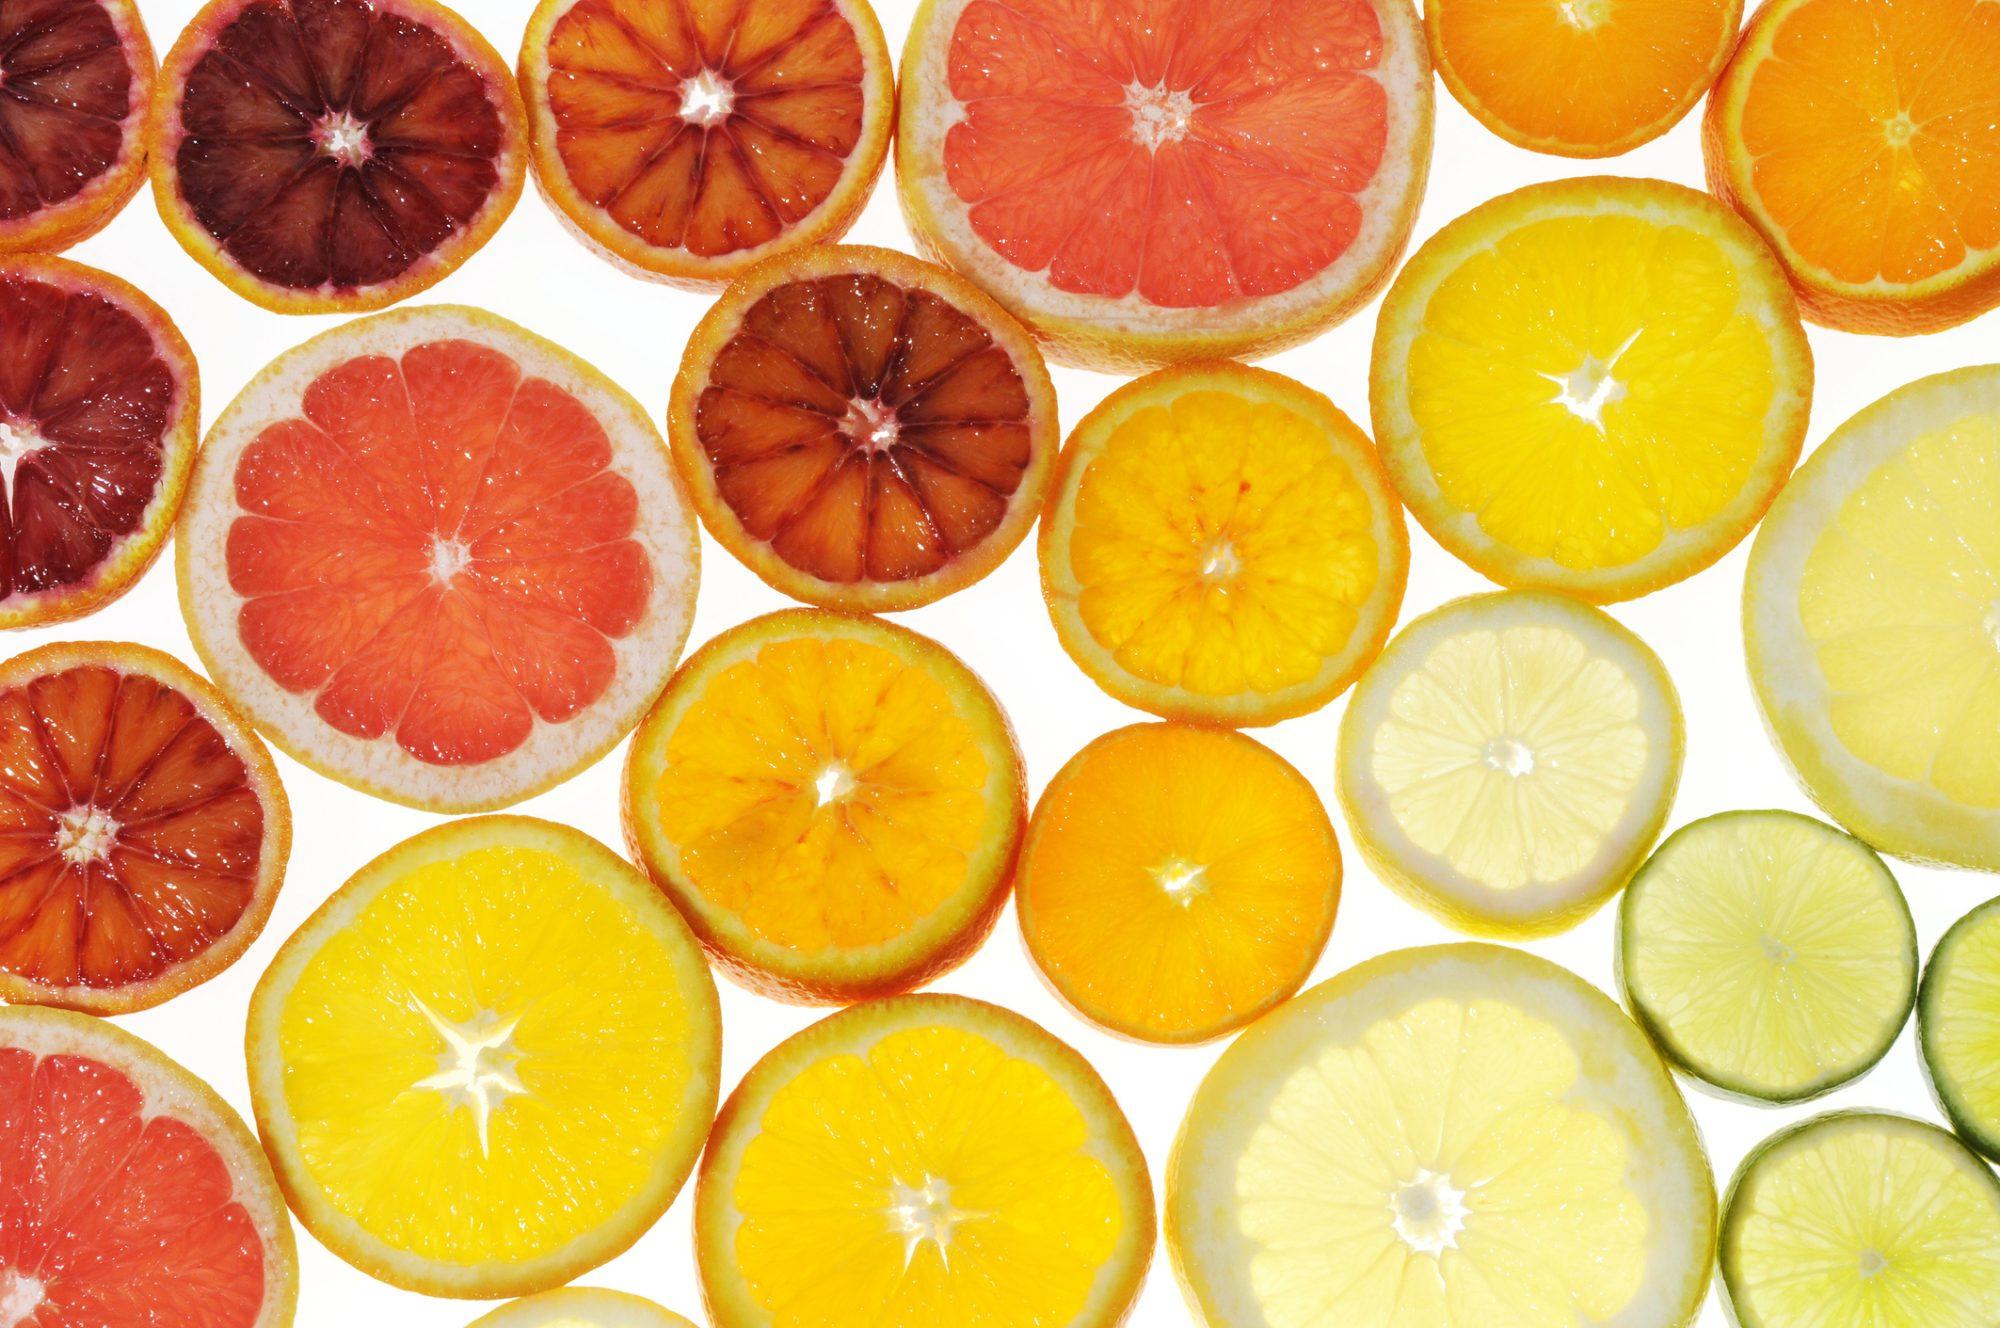 Slices of citrus fruit image